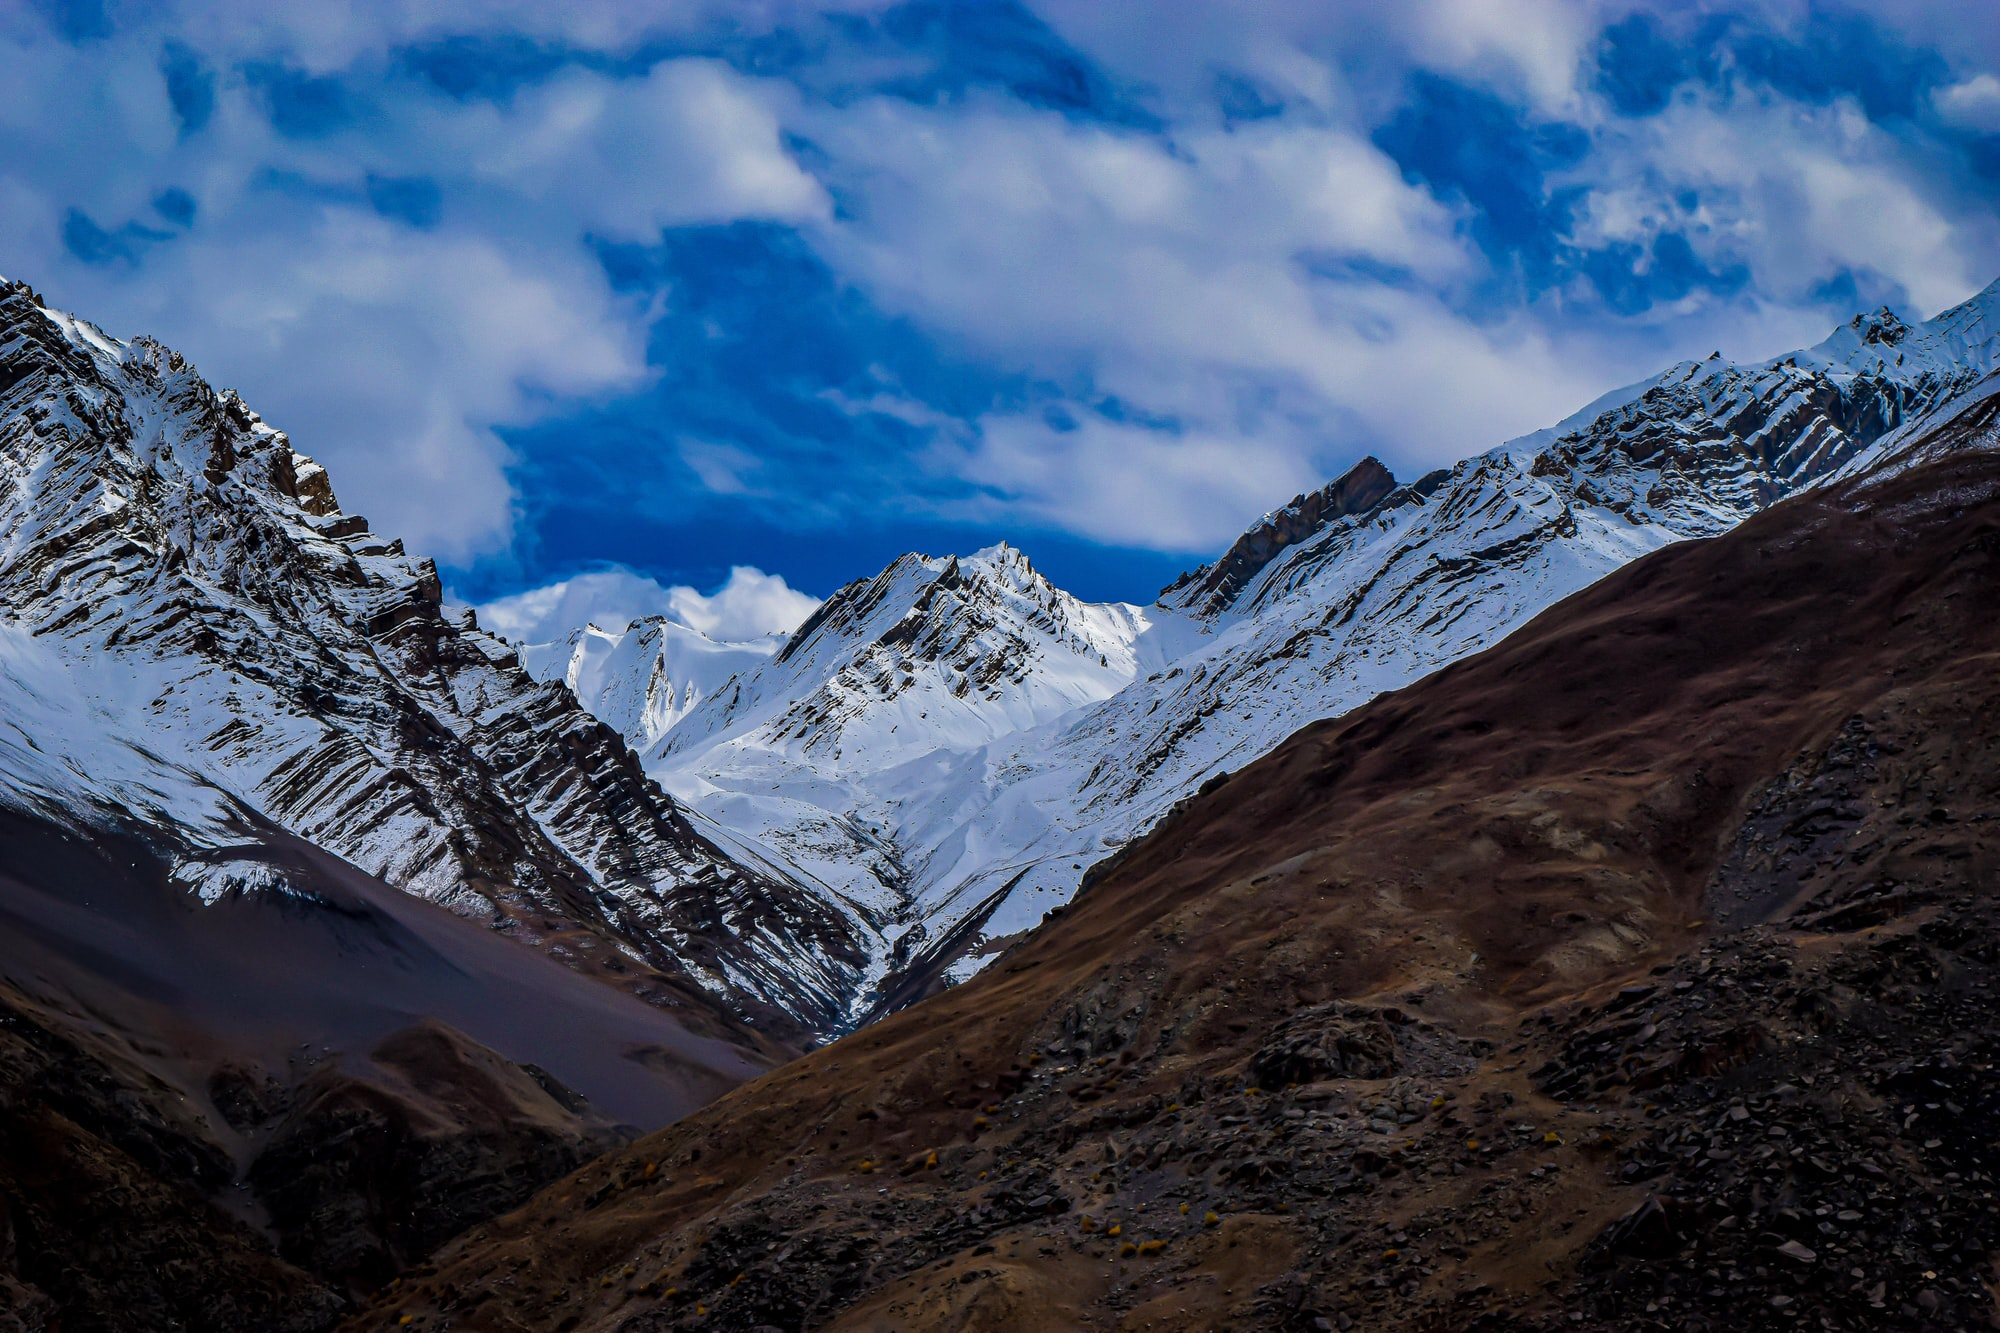 The Himalayas, standing tall!